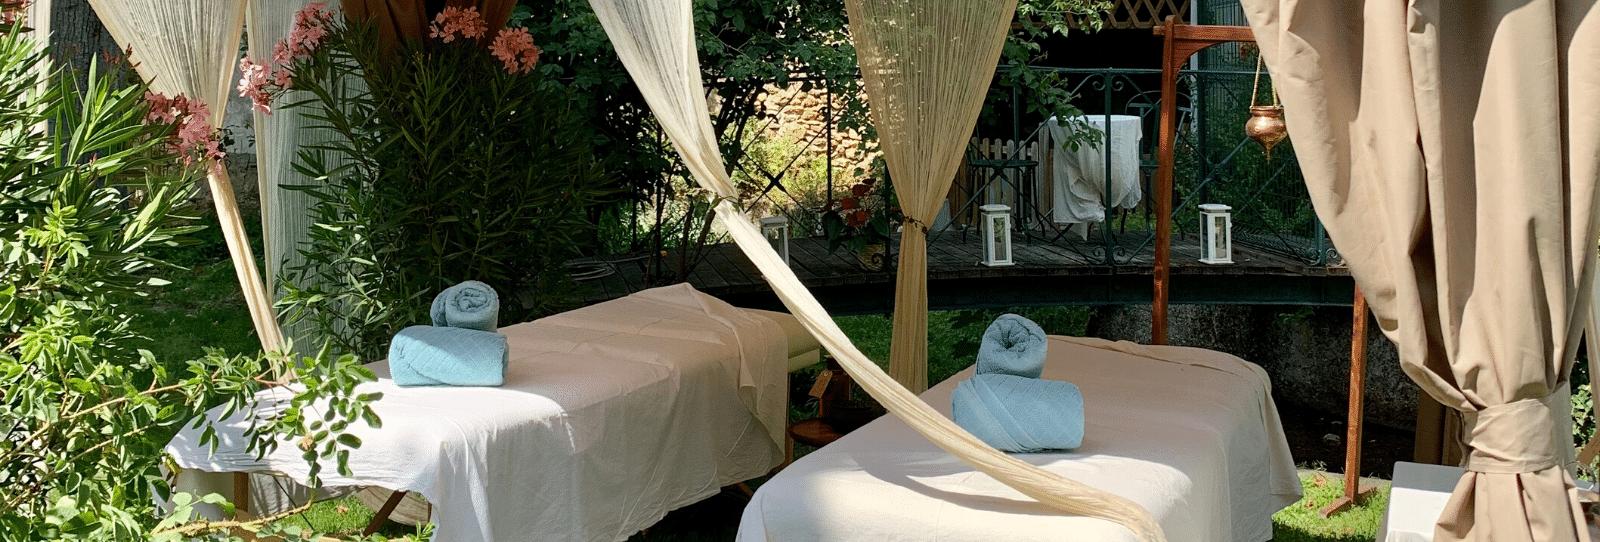 Massage ayurveda sante